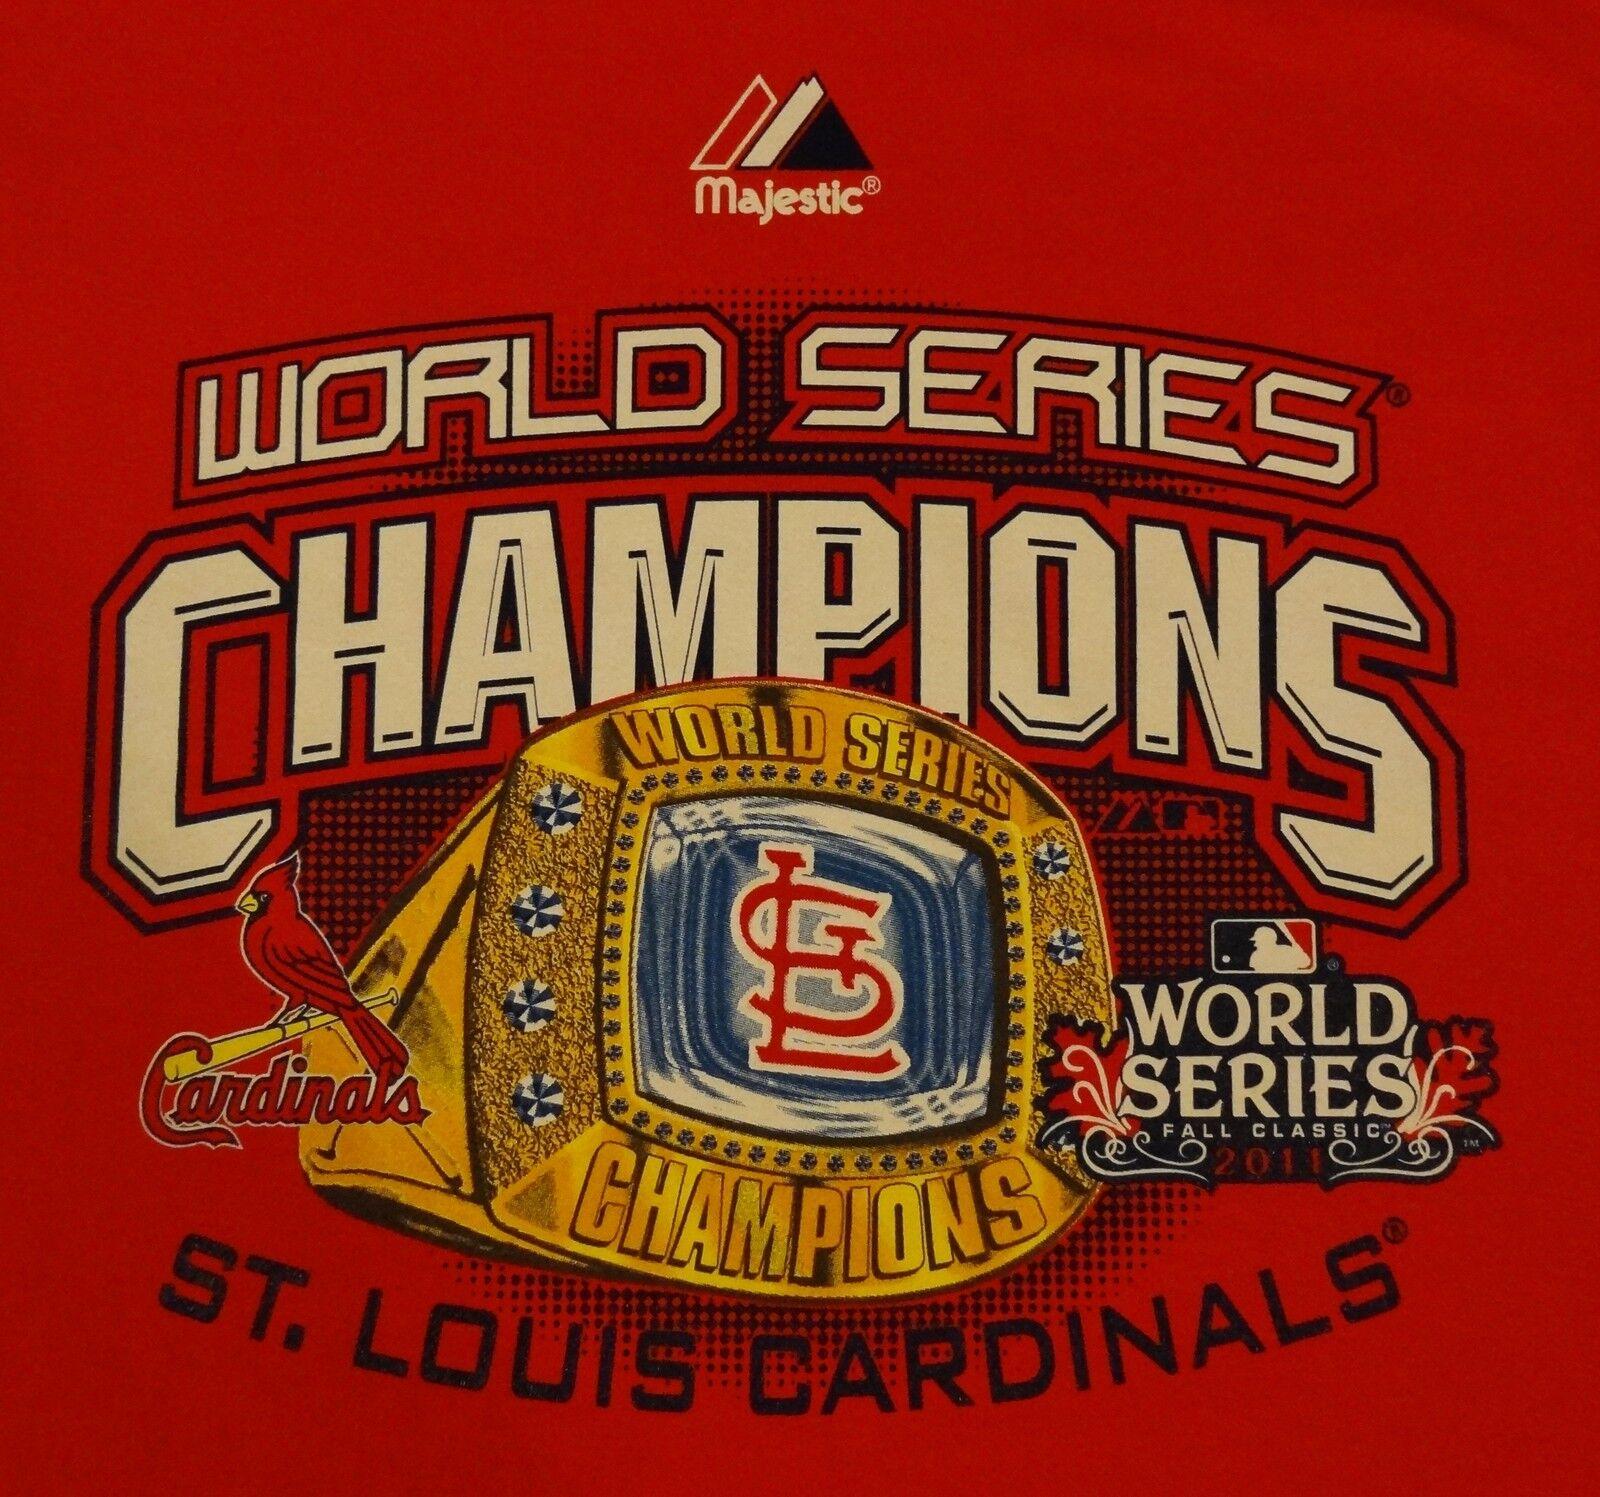 St. Louis Cardinals 2011 World Series Champions Crew Neck Sweatshirt M